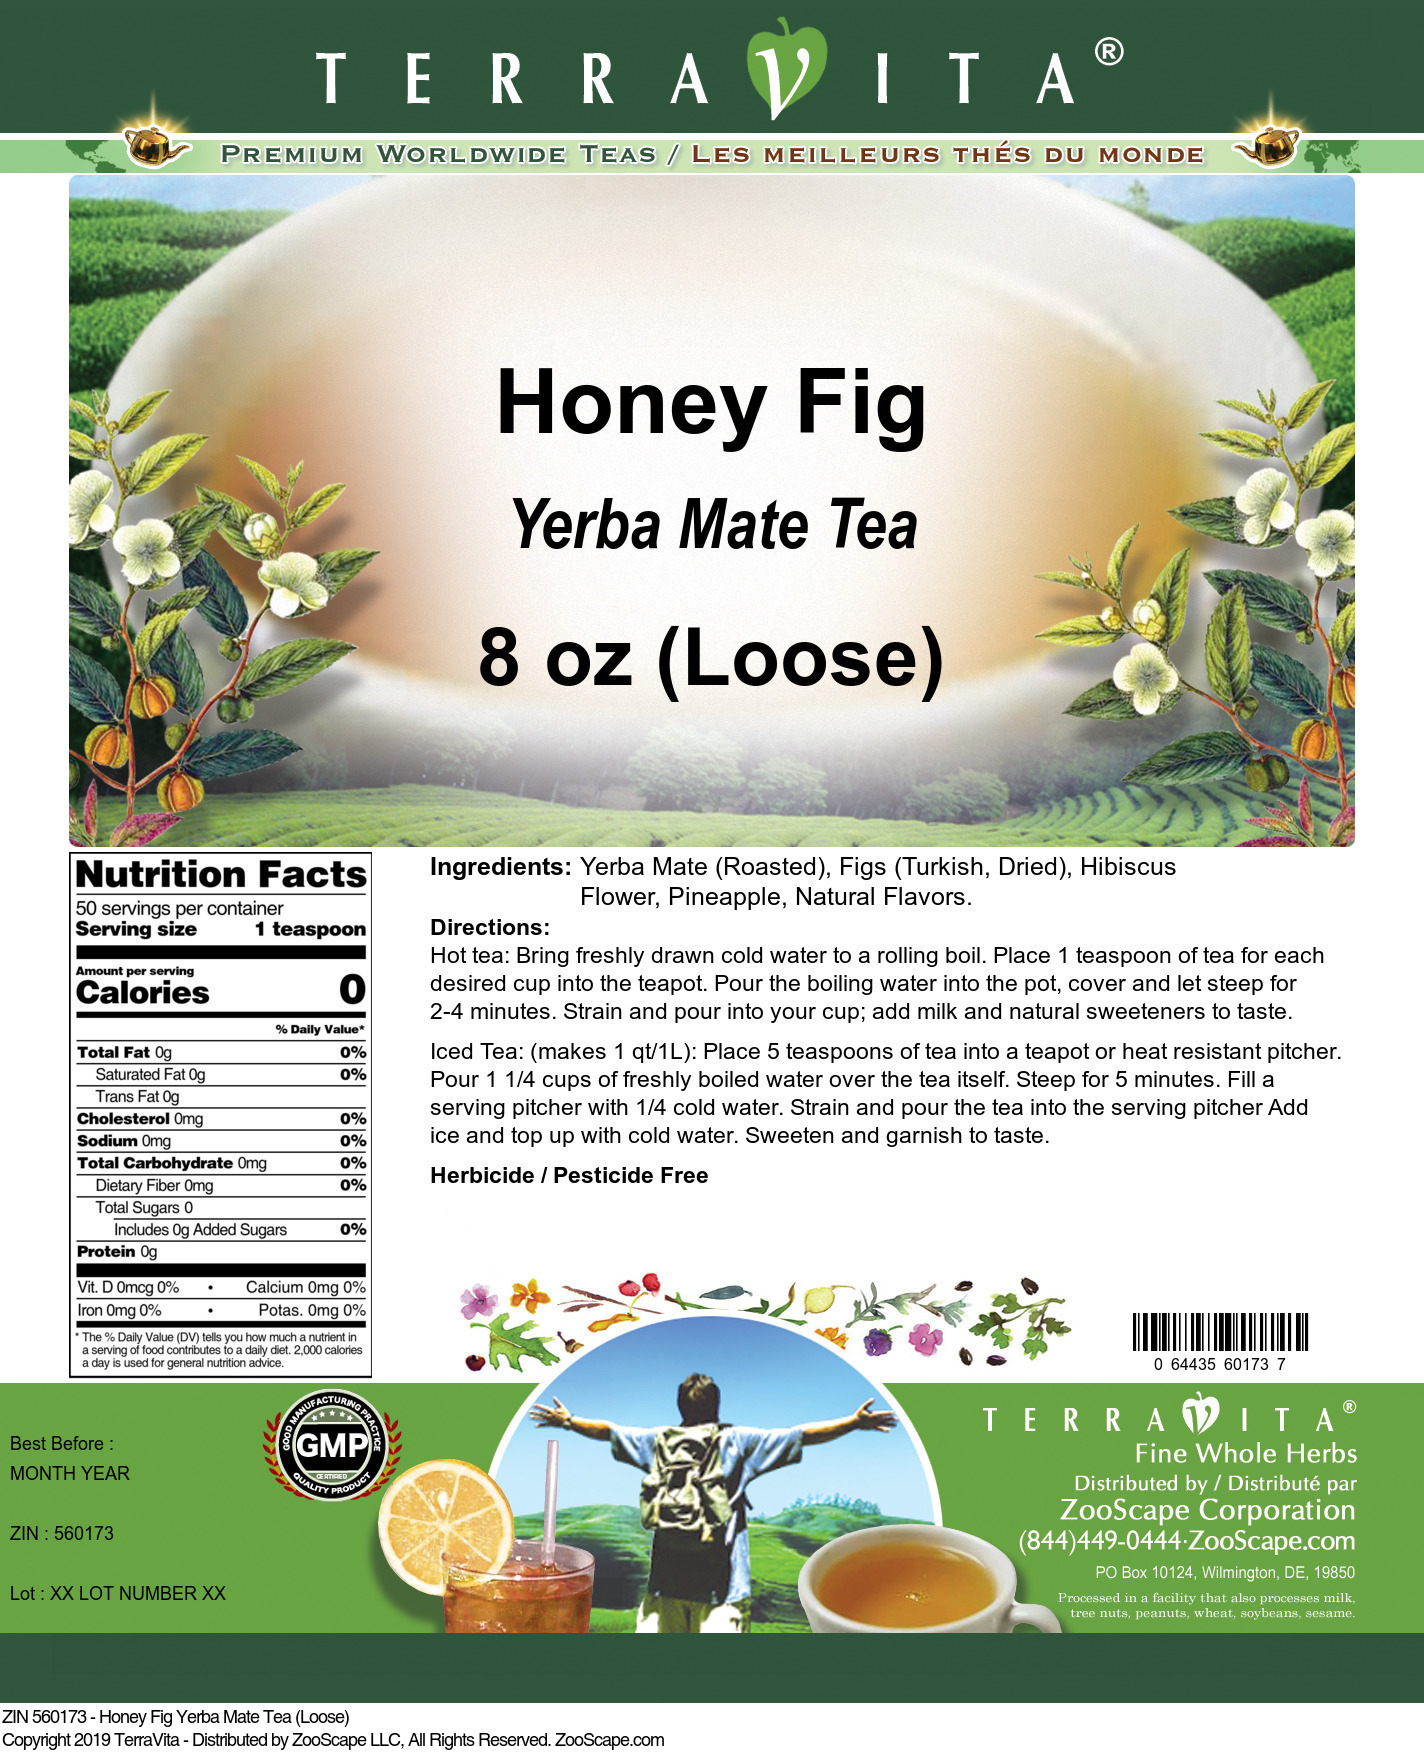 Honey Fig Yerba Mate Tea (Loose)